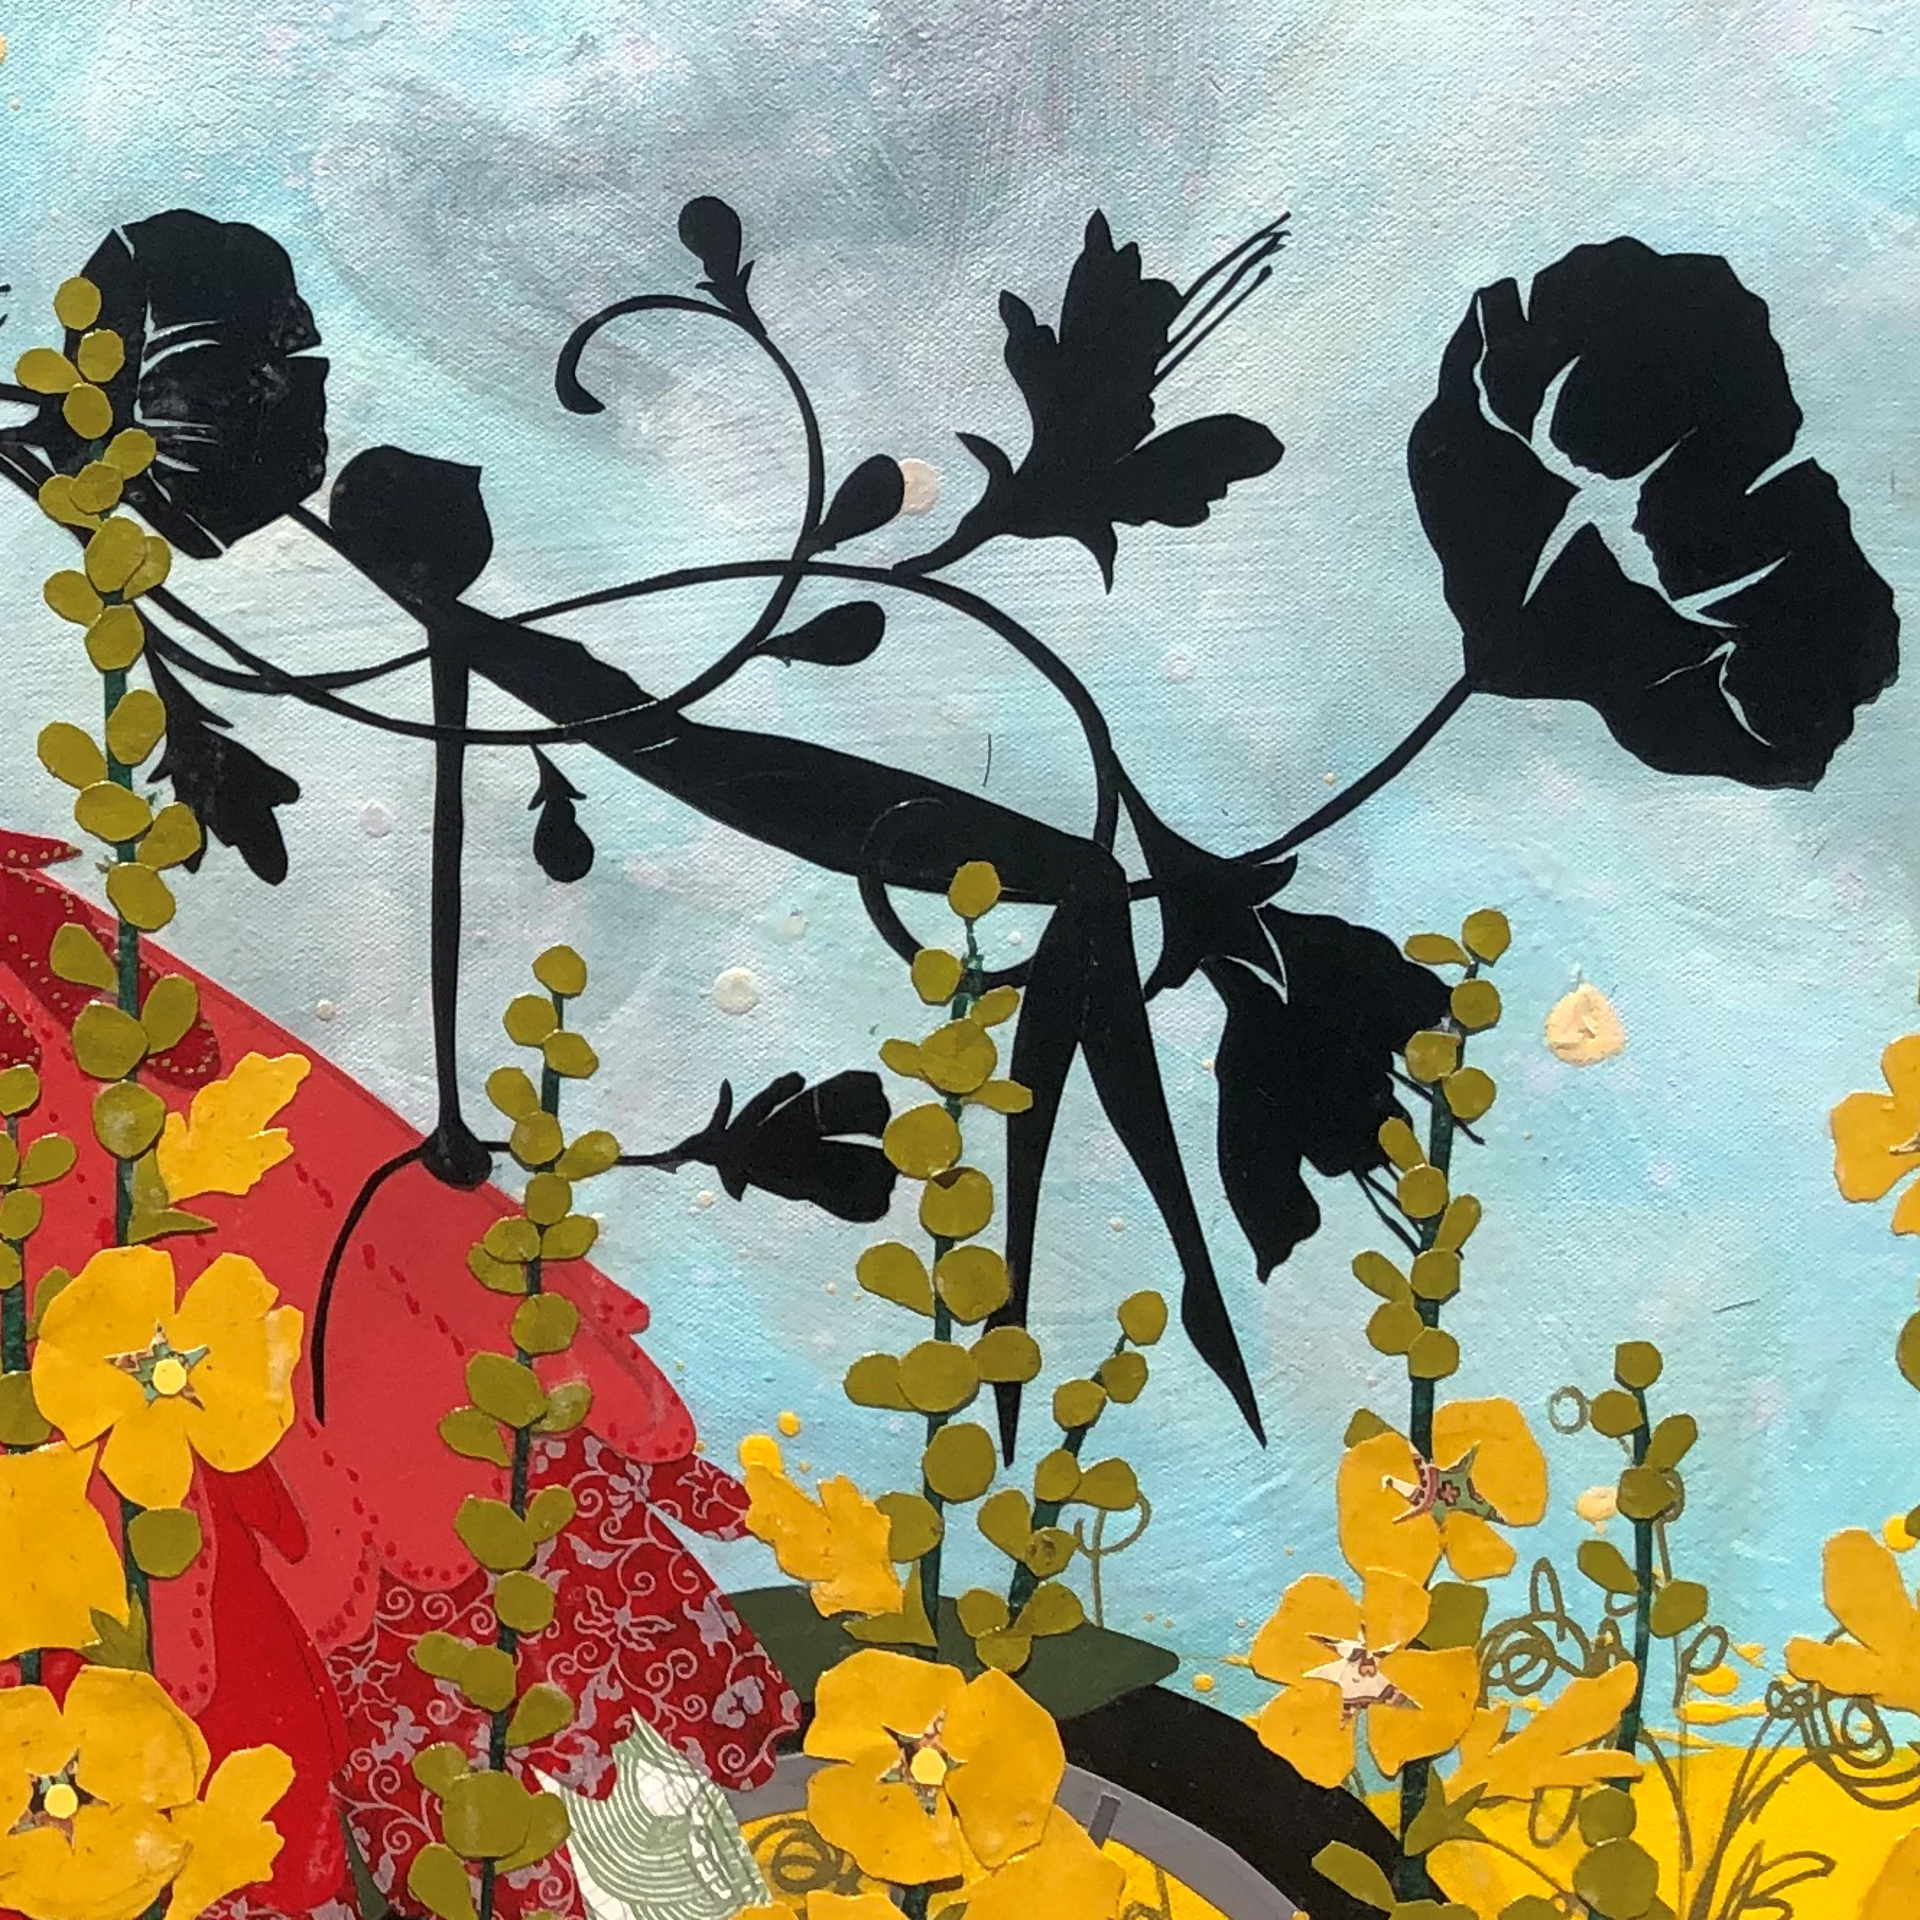 Untangling by Denise Duong